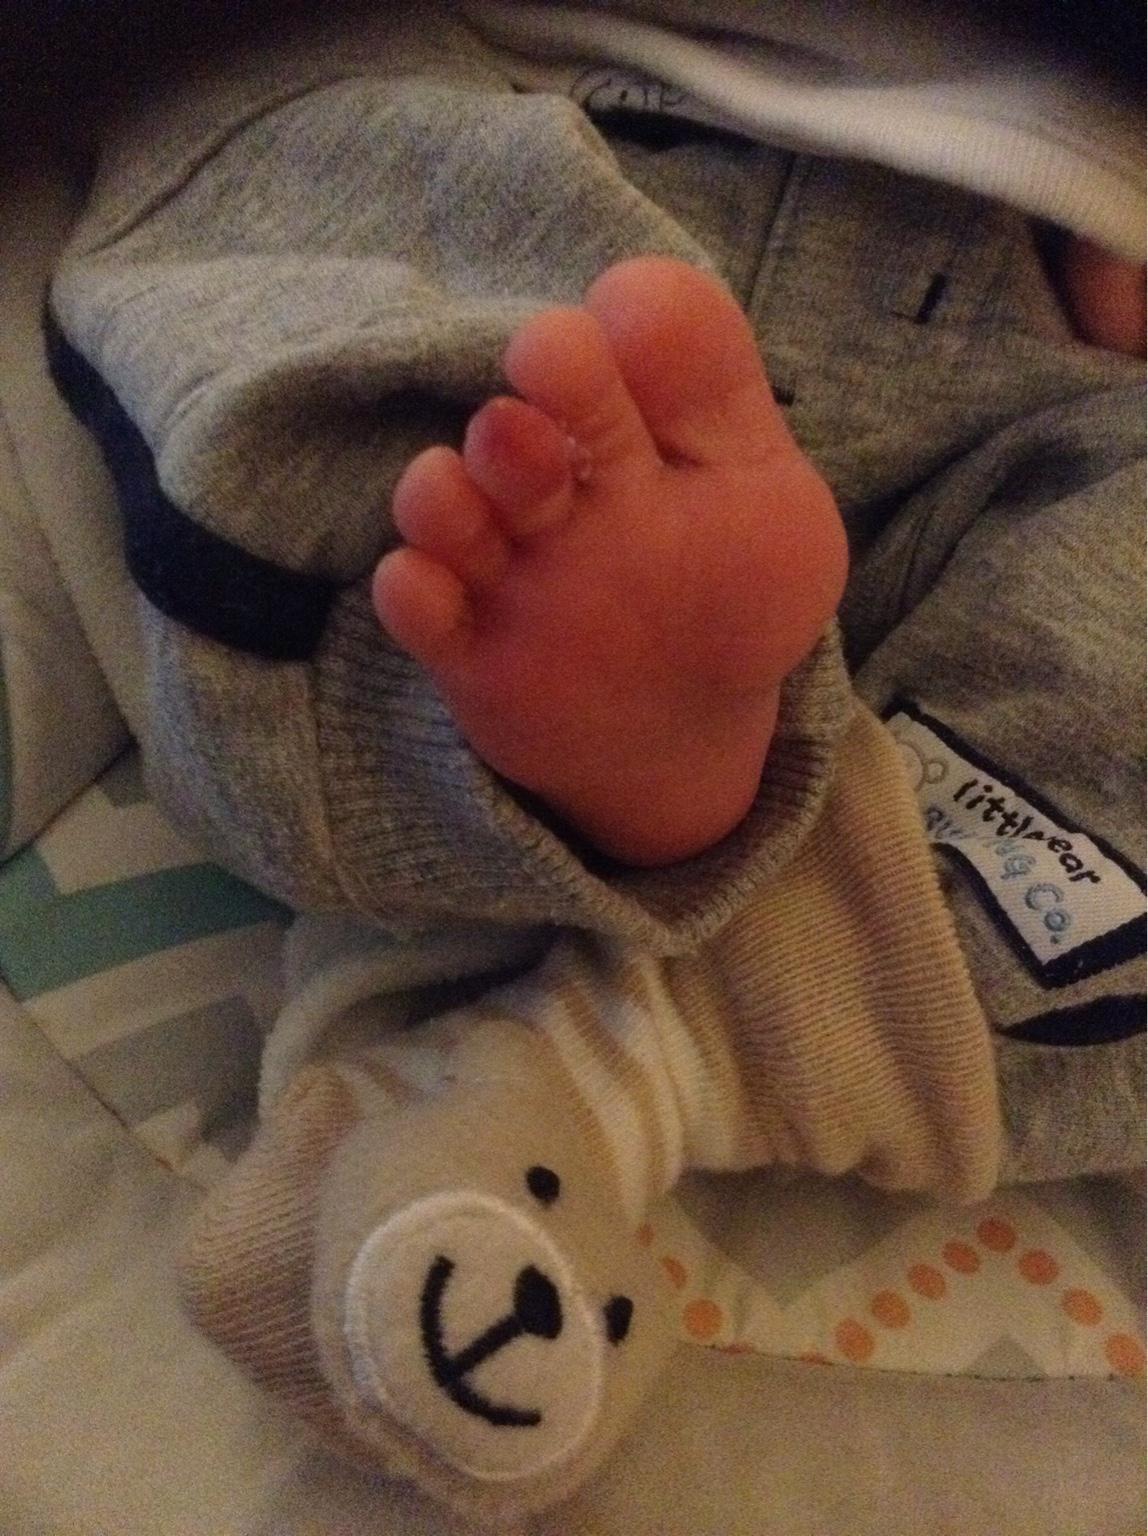 Birth marks | Netmums